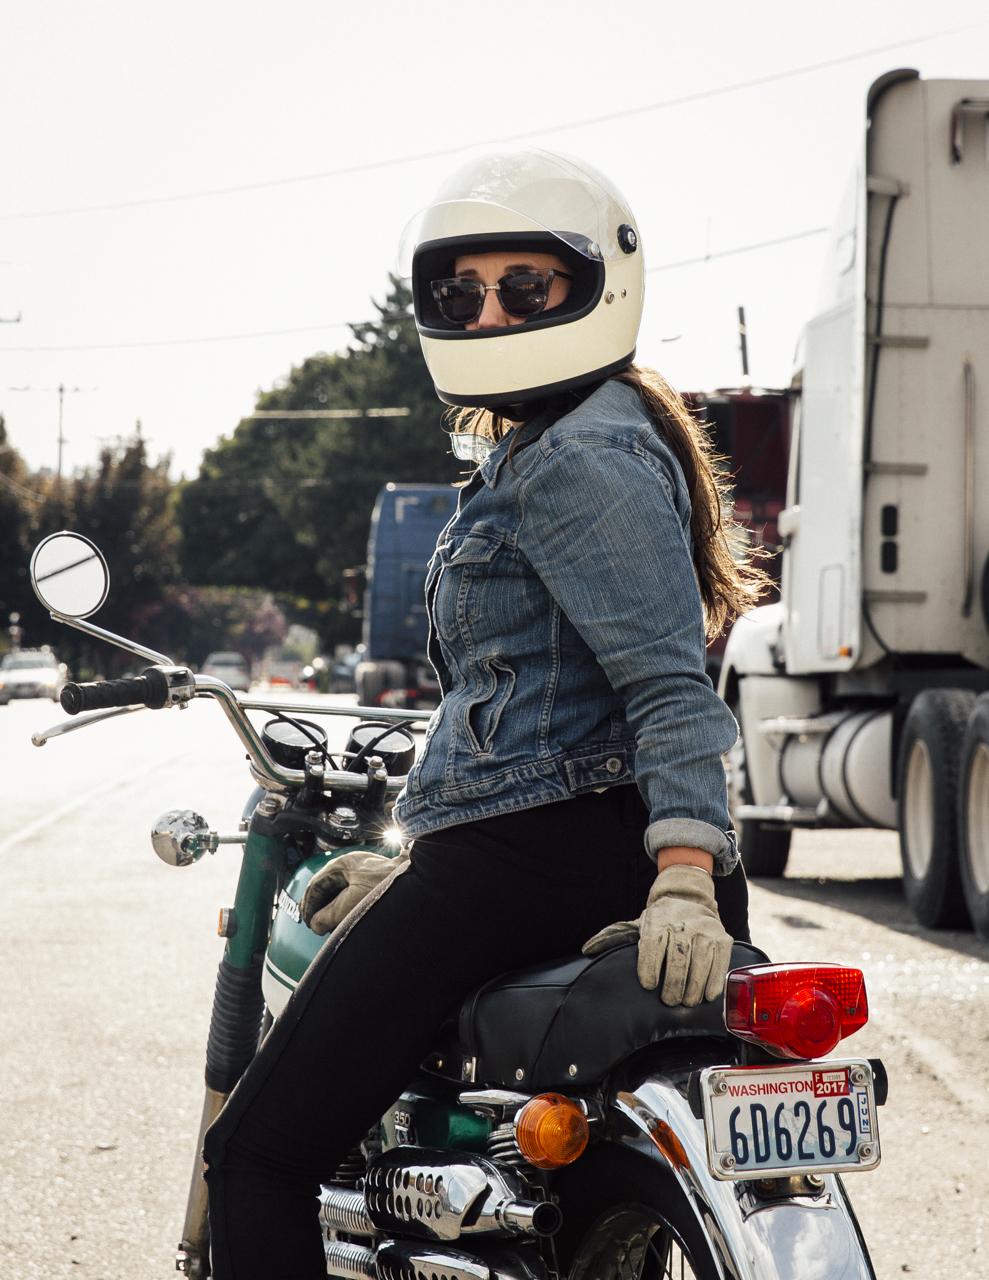 motogirls_19.jpg